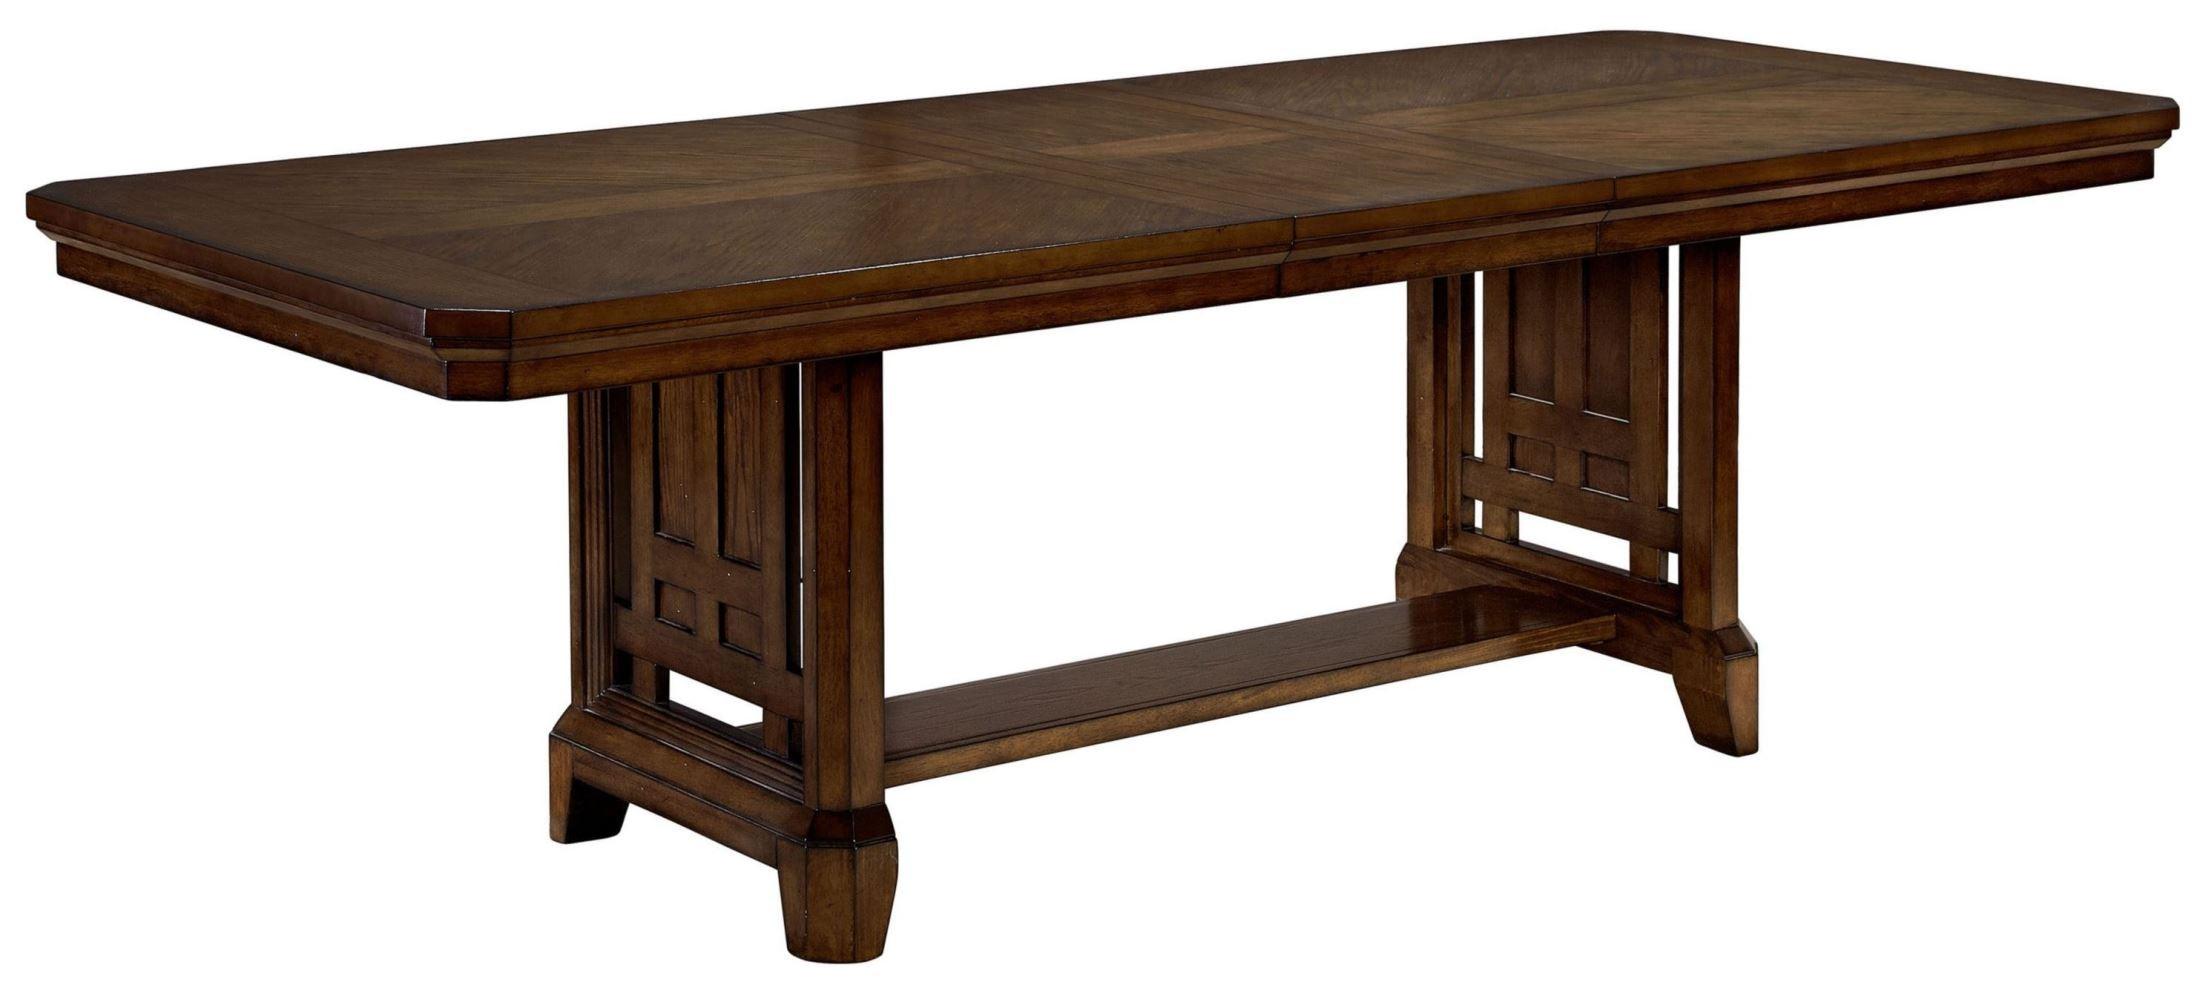 estes park artisan oak rectangular extendable trestle dining table from broyhill 4364 531 551. Black Bedroom Furniture Sets. Home Design Ideas